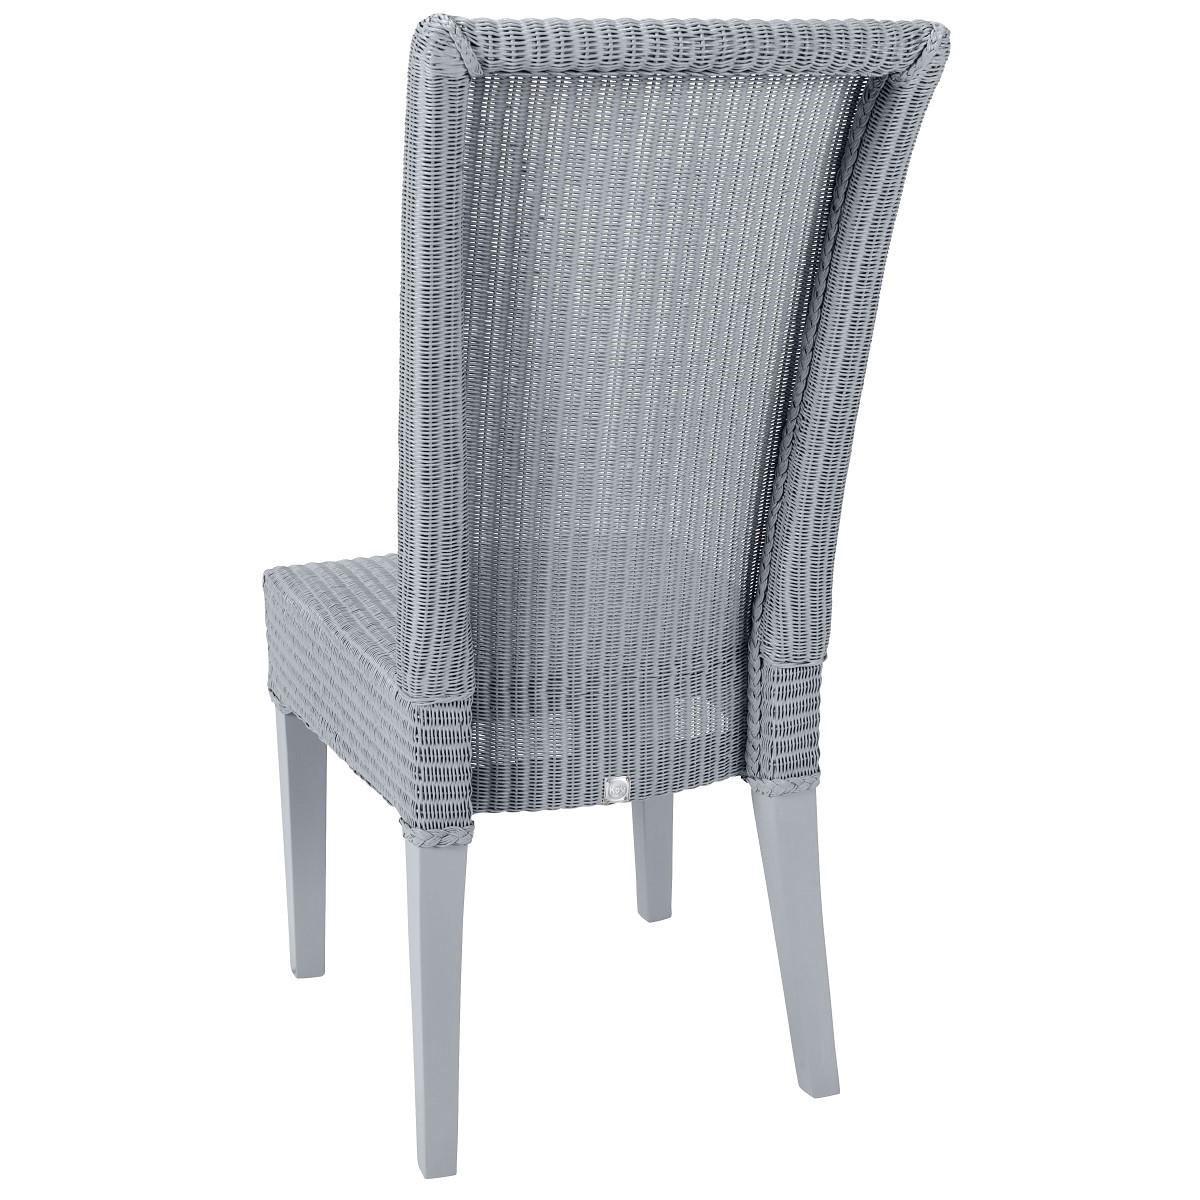 Chaise en Lloyd Loom laqué bleu gris